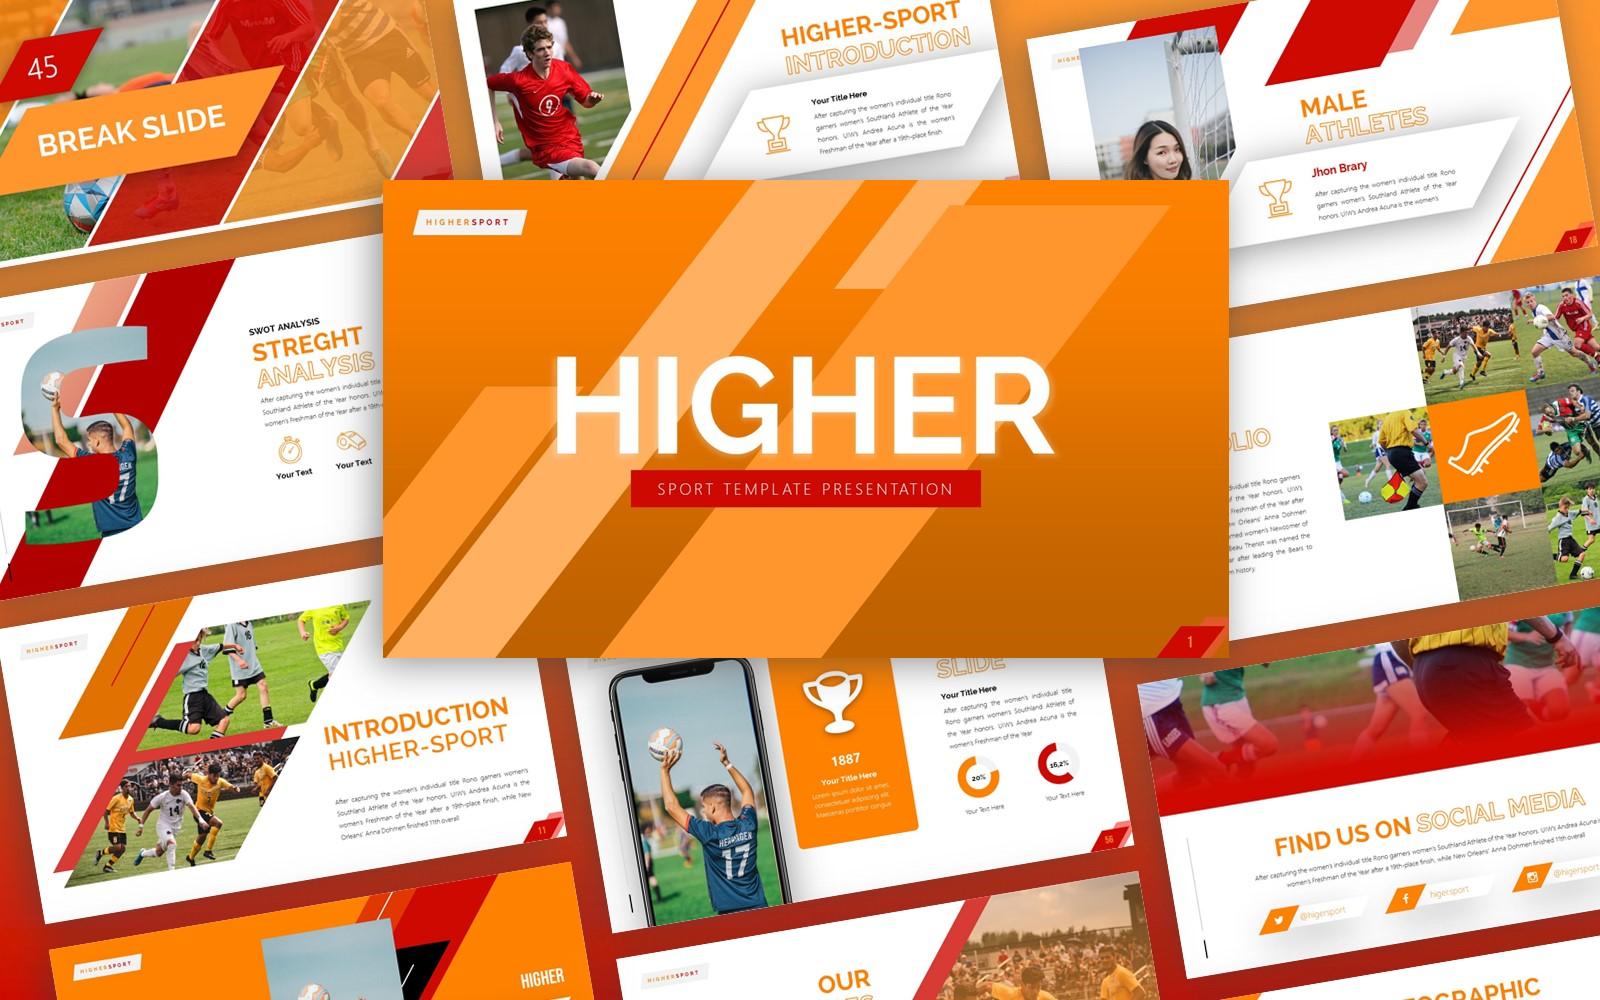 Higher - Sport Multipurpose PowerPoint template